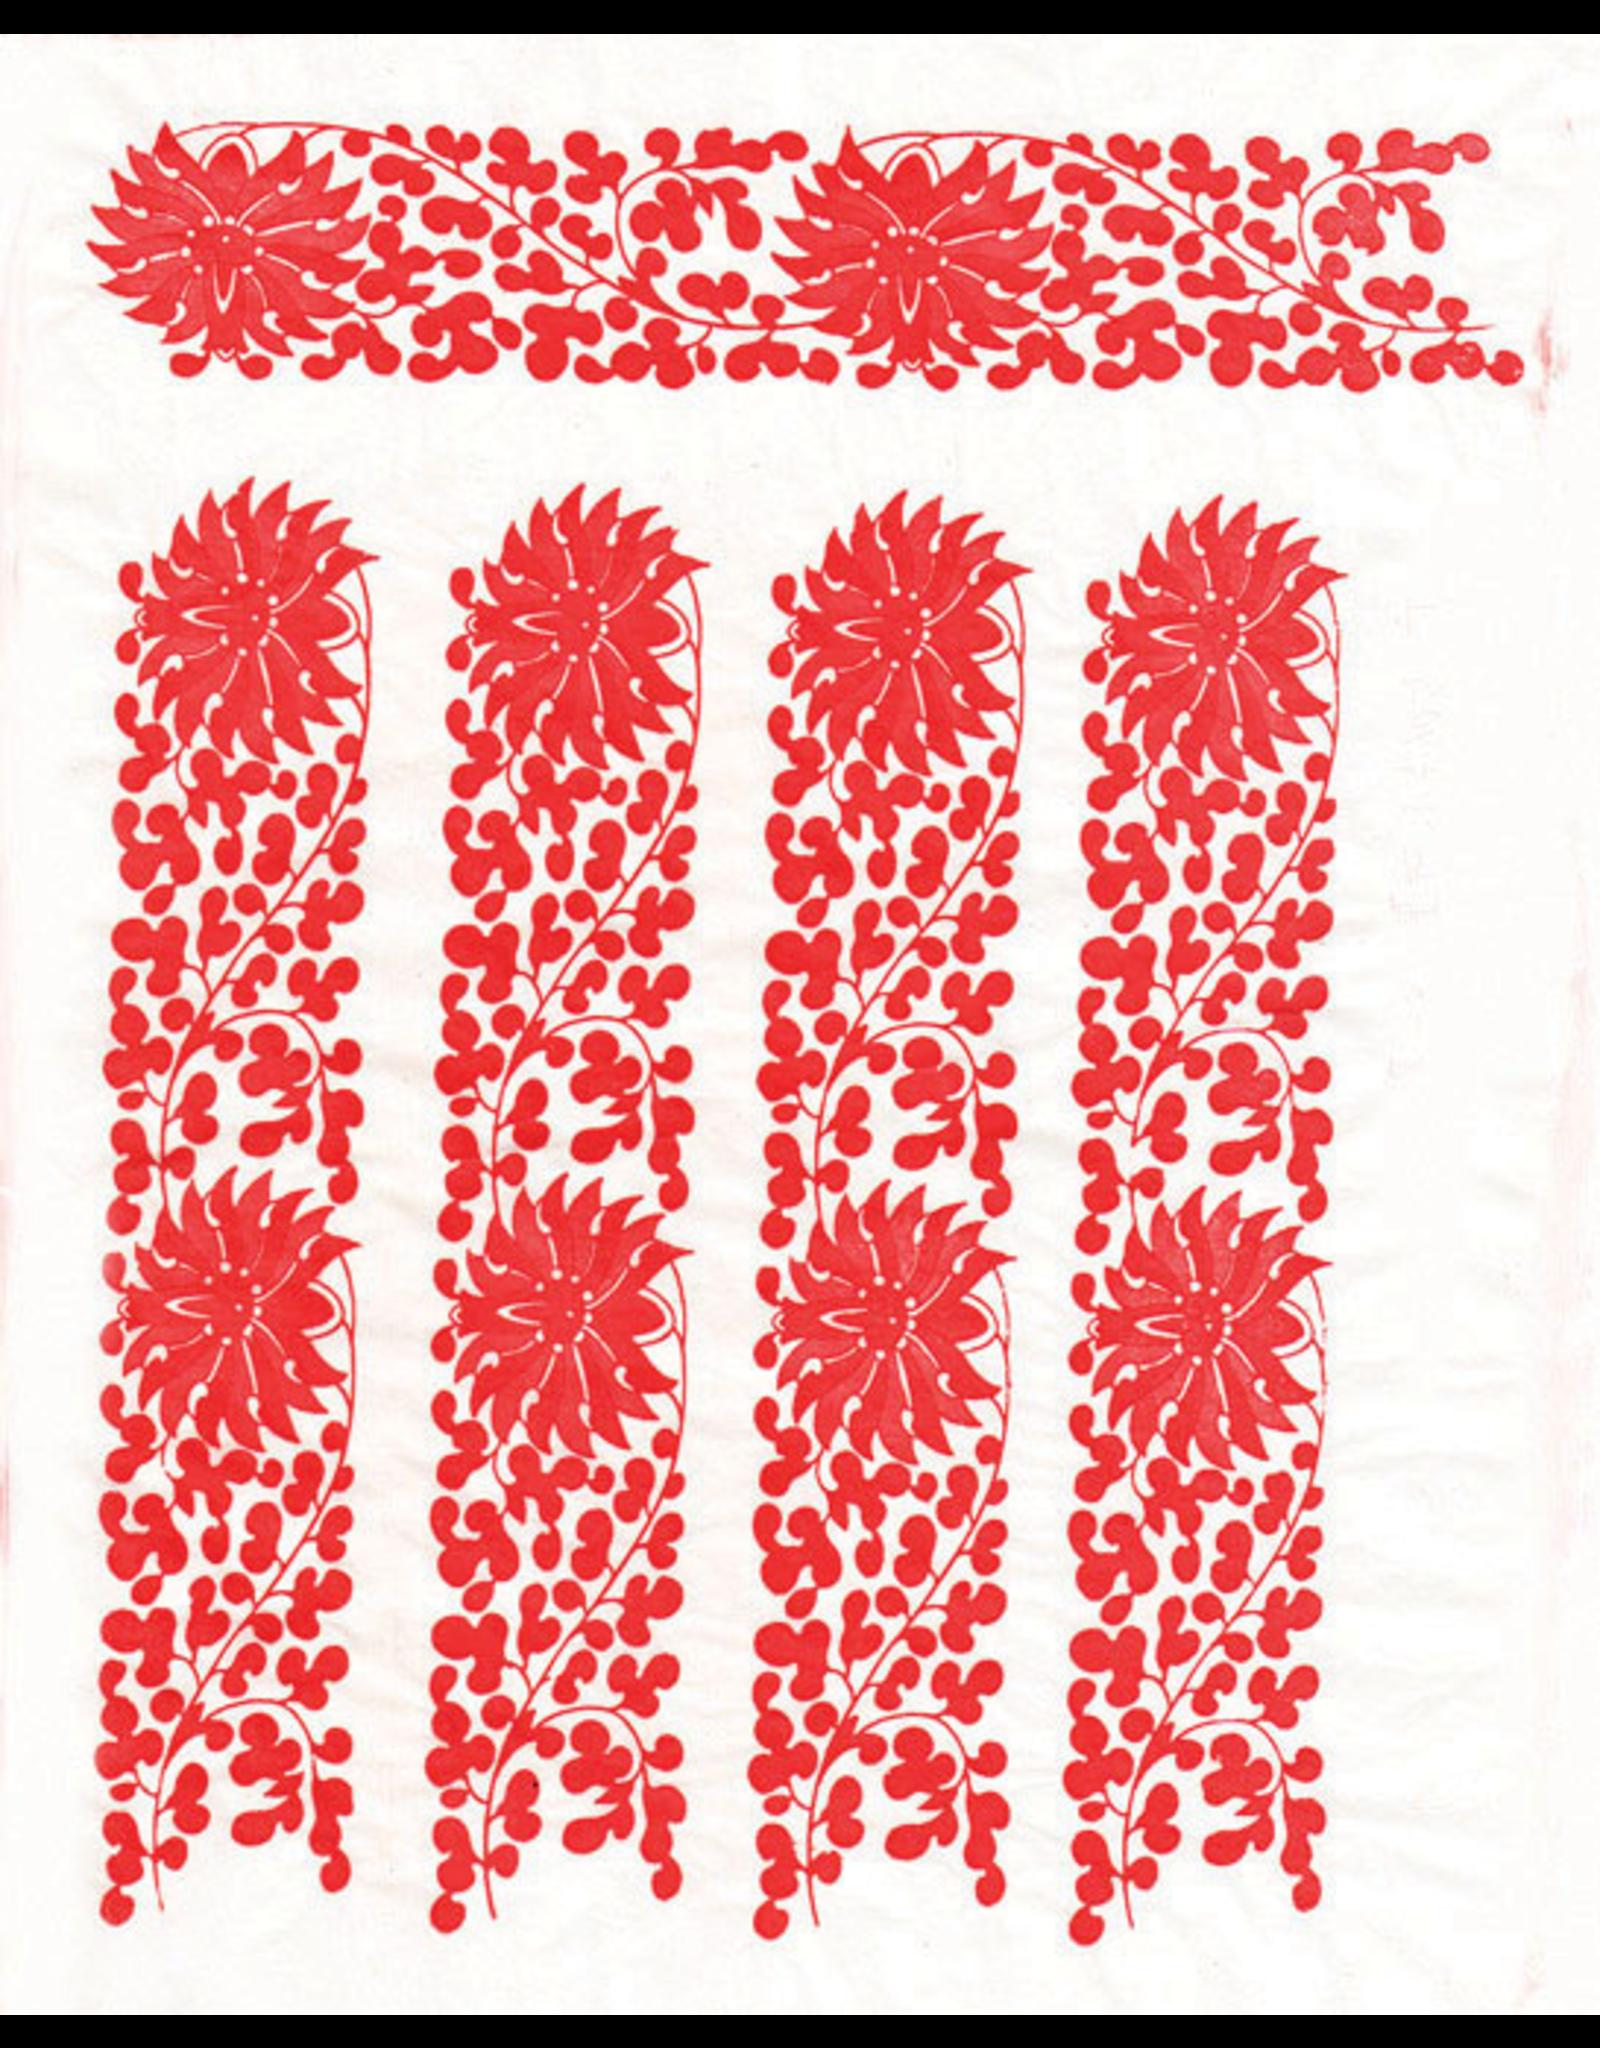 Sanbao Flower decal 12